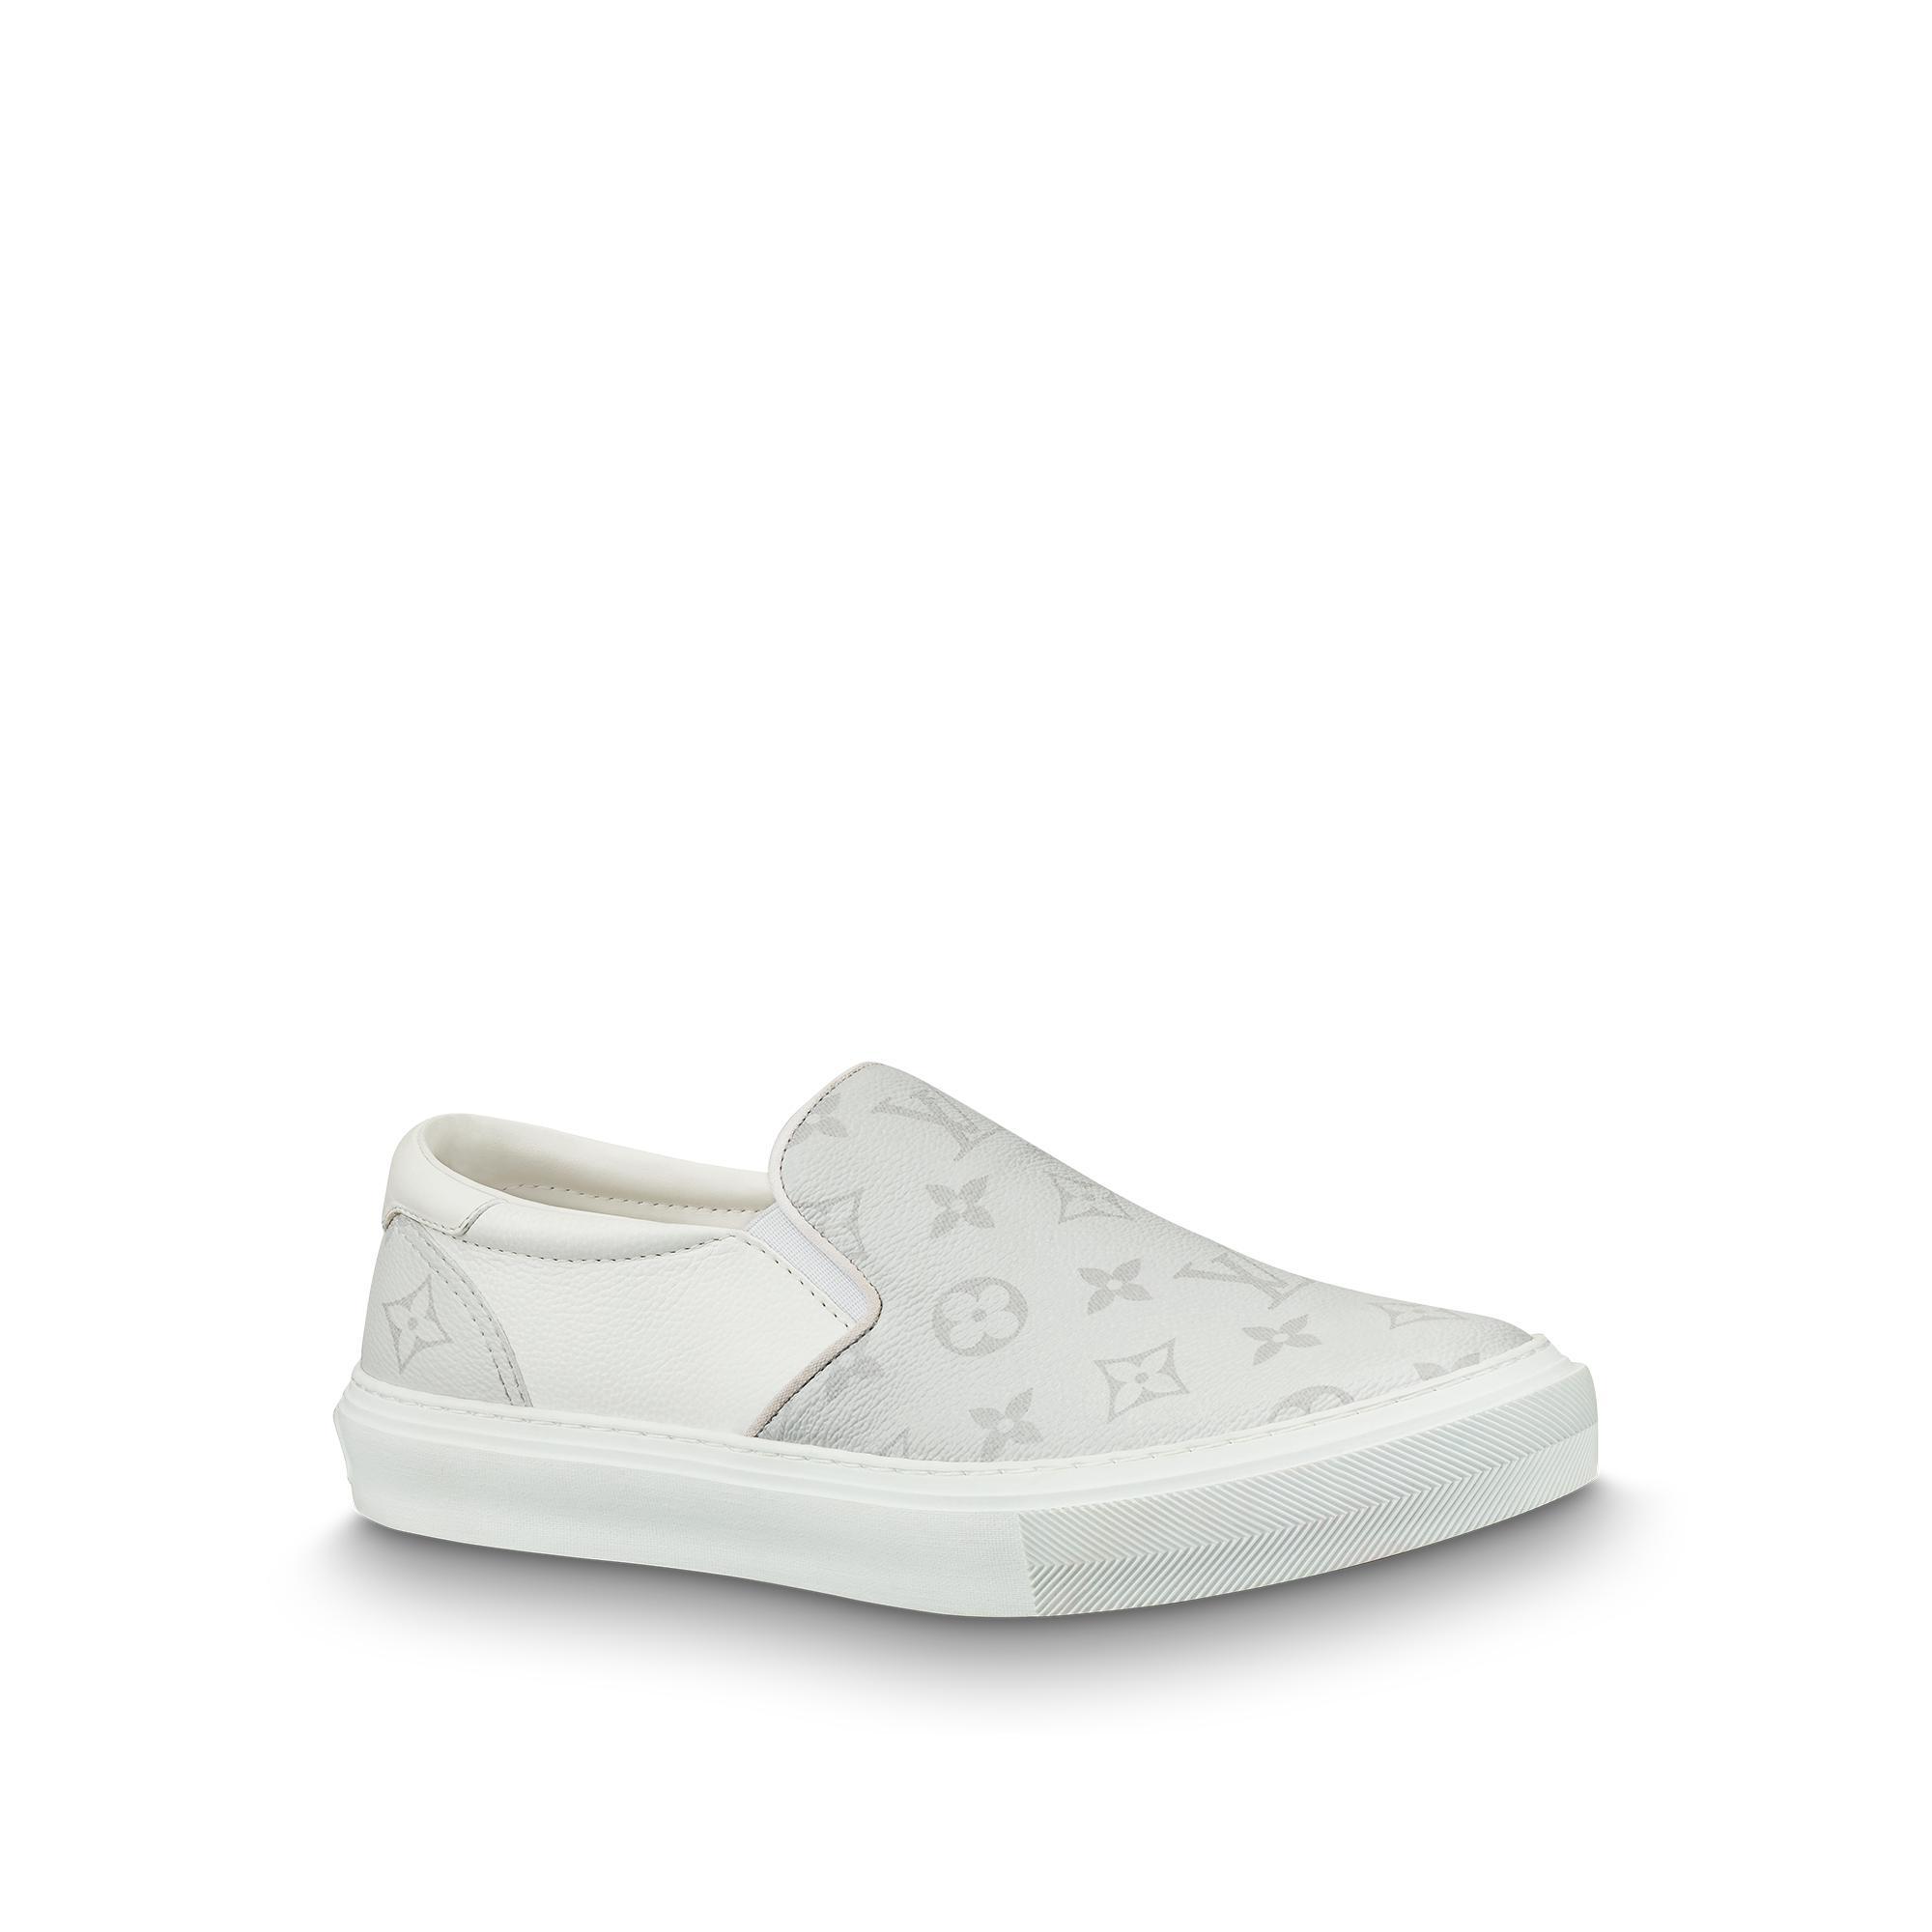 1ae311f58f04 Louis Vuitton Trocadero Slip On